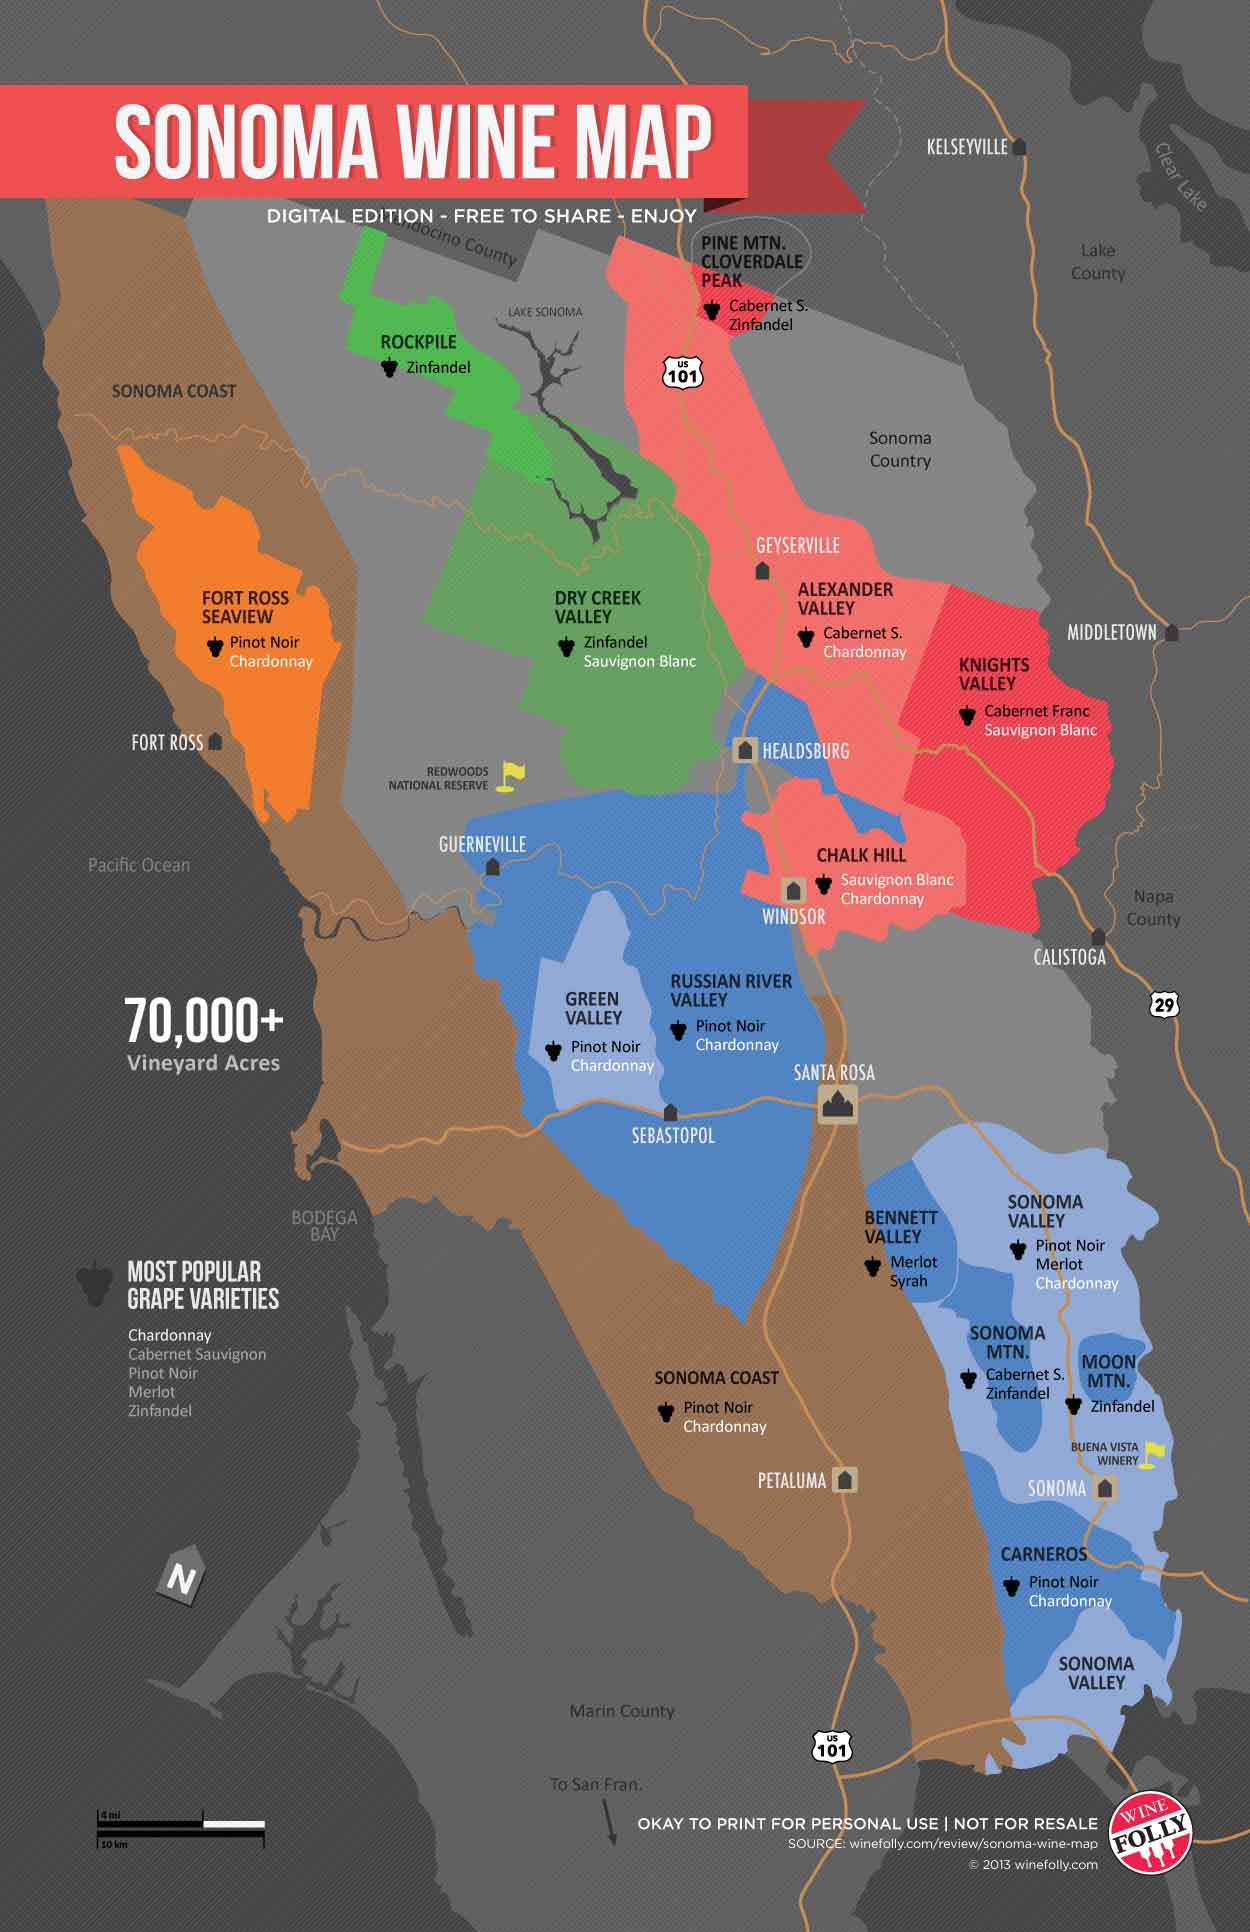 Sonoma-Wine-Map-wine-folly